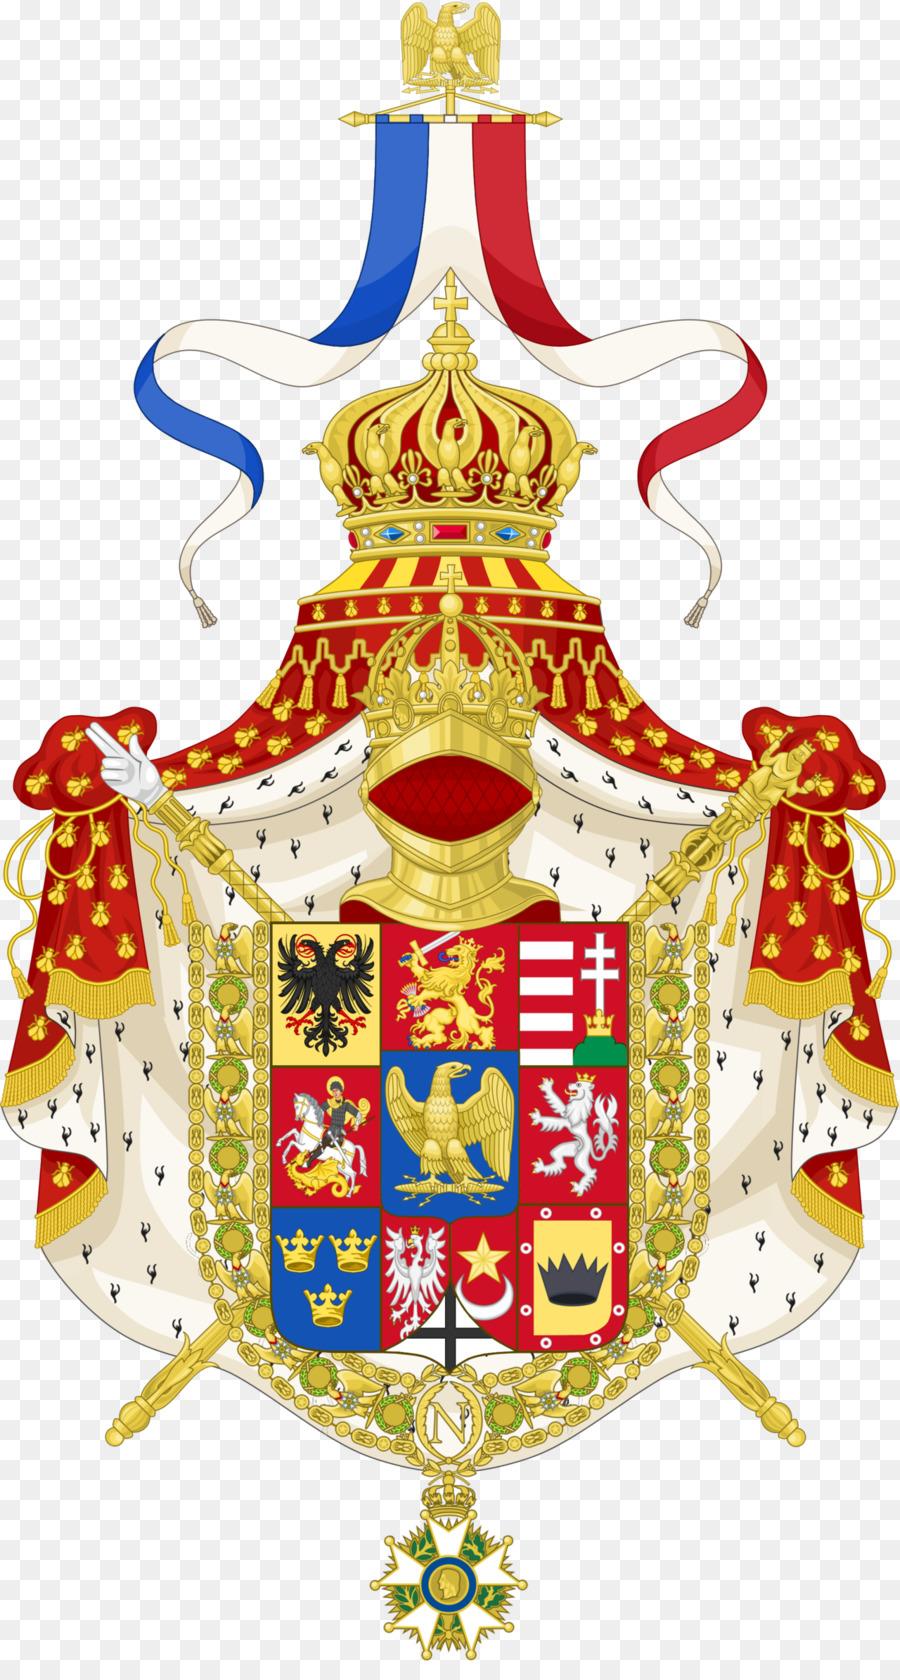 National Emblem Of France Coat Of Arms Blasons Et Armoiries Heraldry